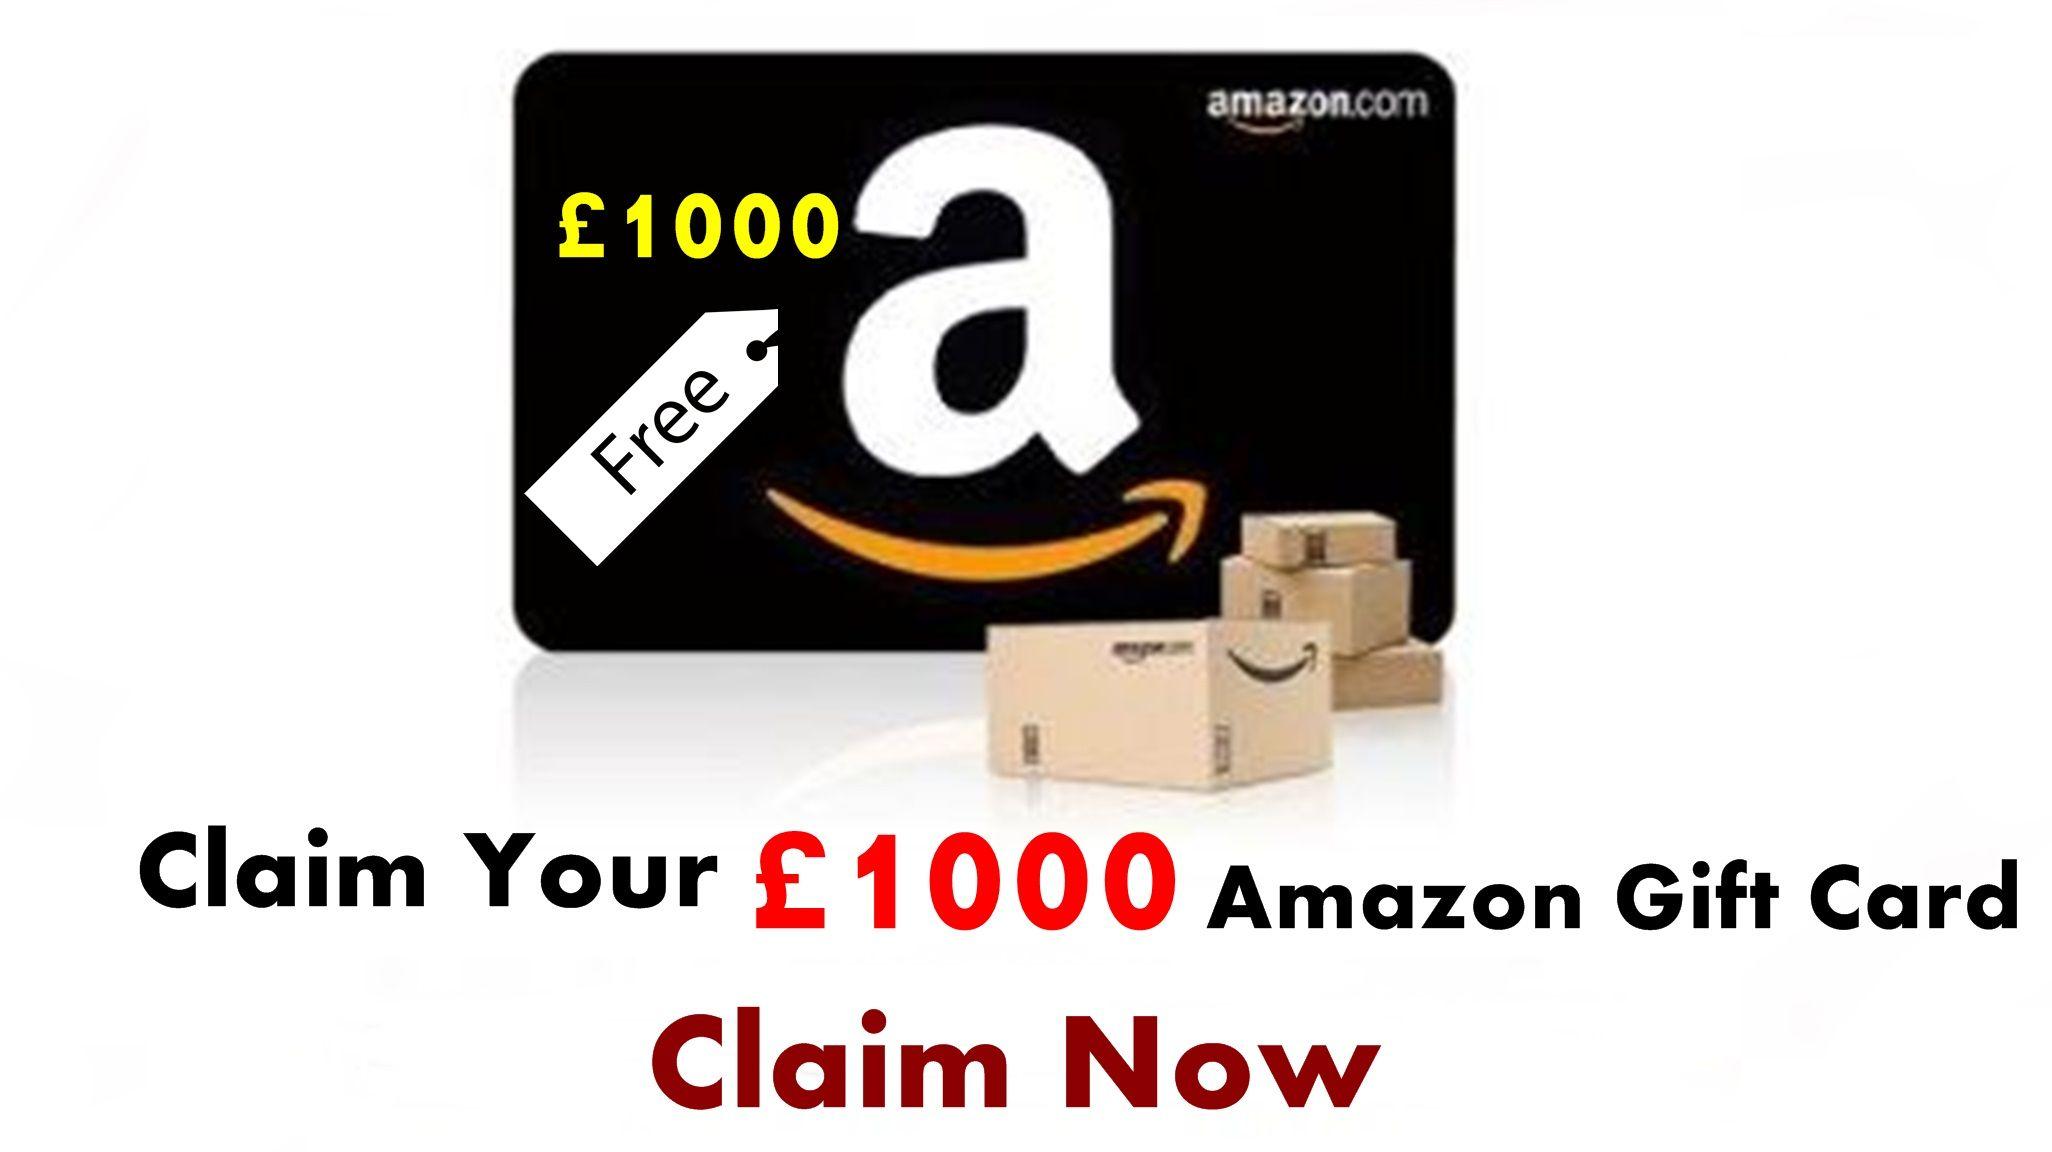 Generator Free Amazon Gift Code Generator No Human Verification 2020 Now We Are Presenting Best Amazon Gift Card Free Gift Card Generator Amazon Gifts